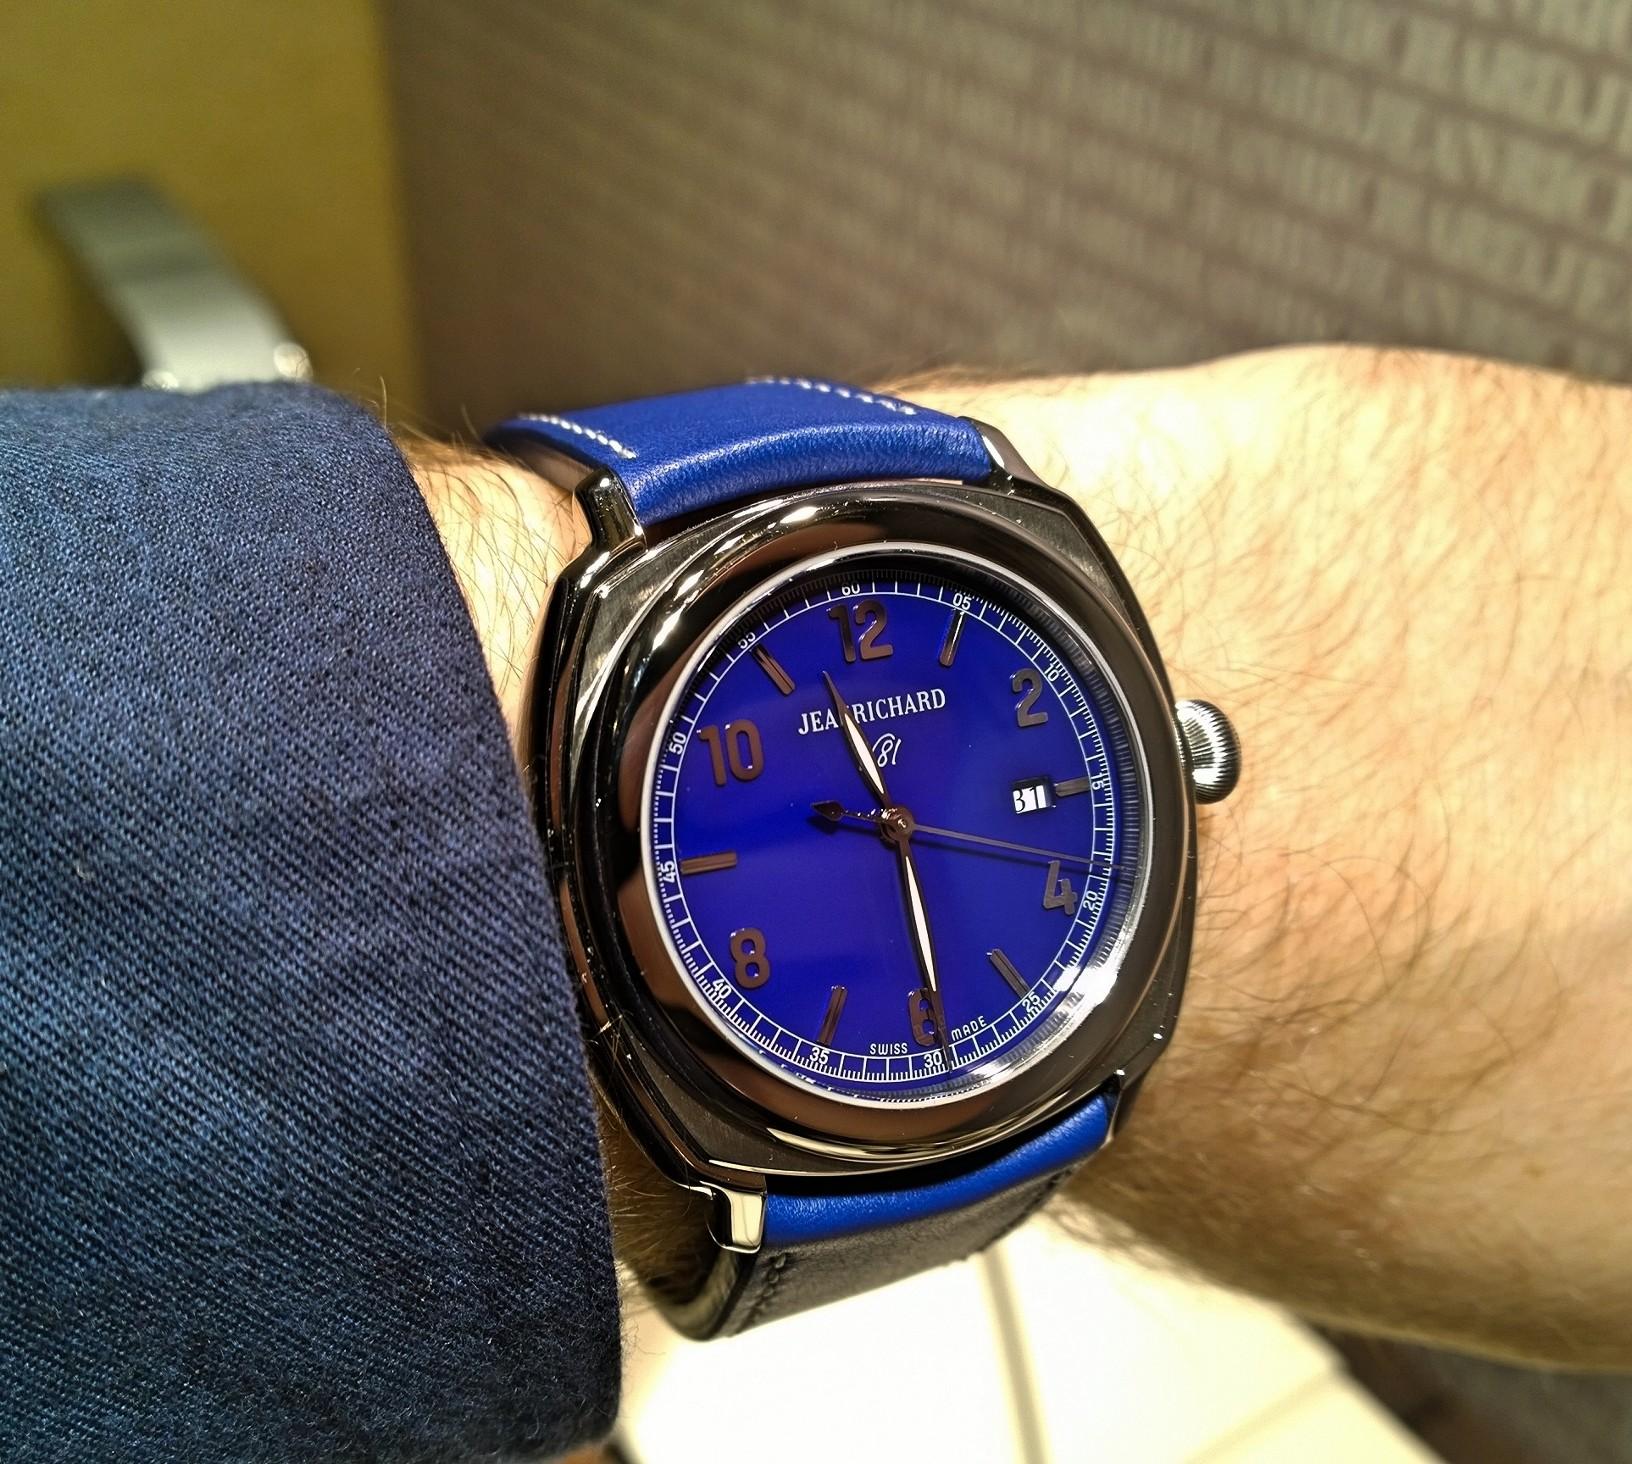 JeanRichard 1681 Blue Dial en acero